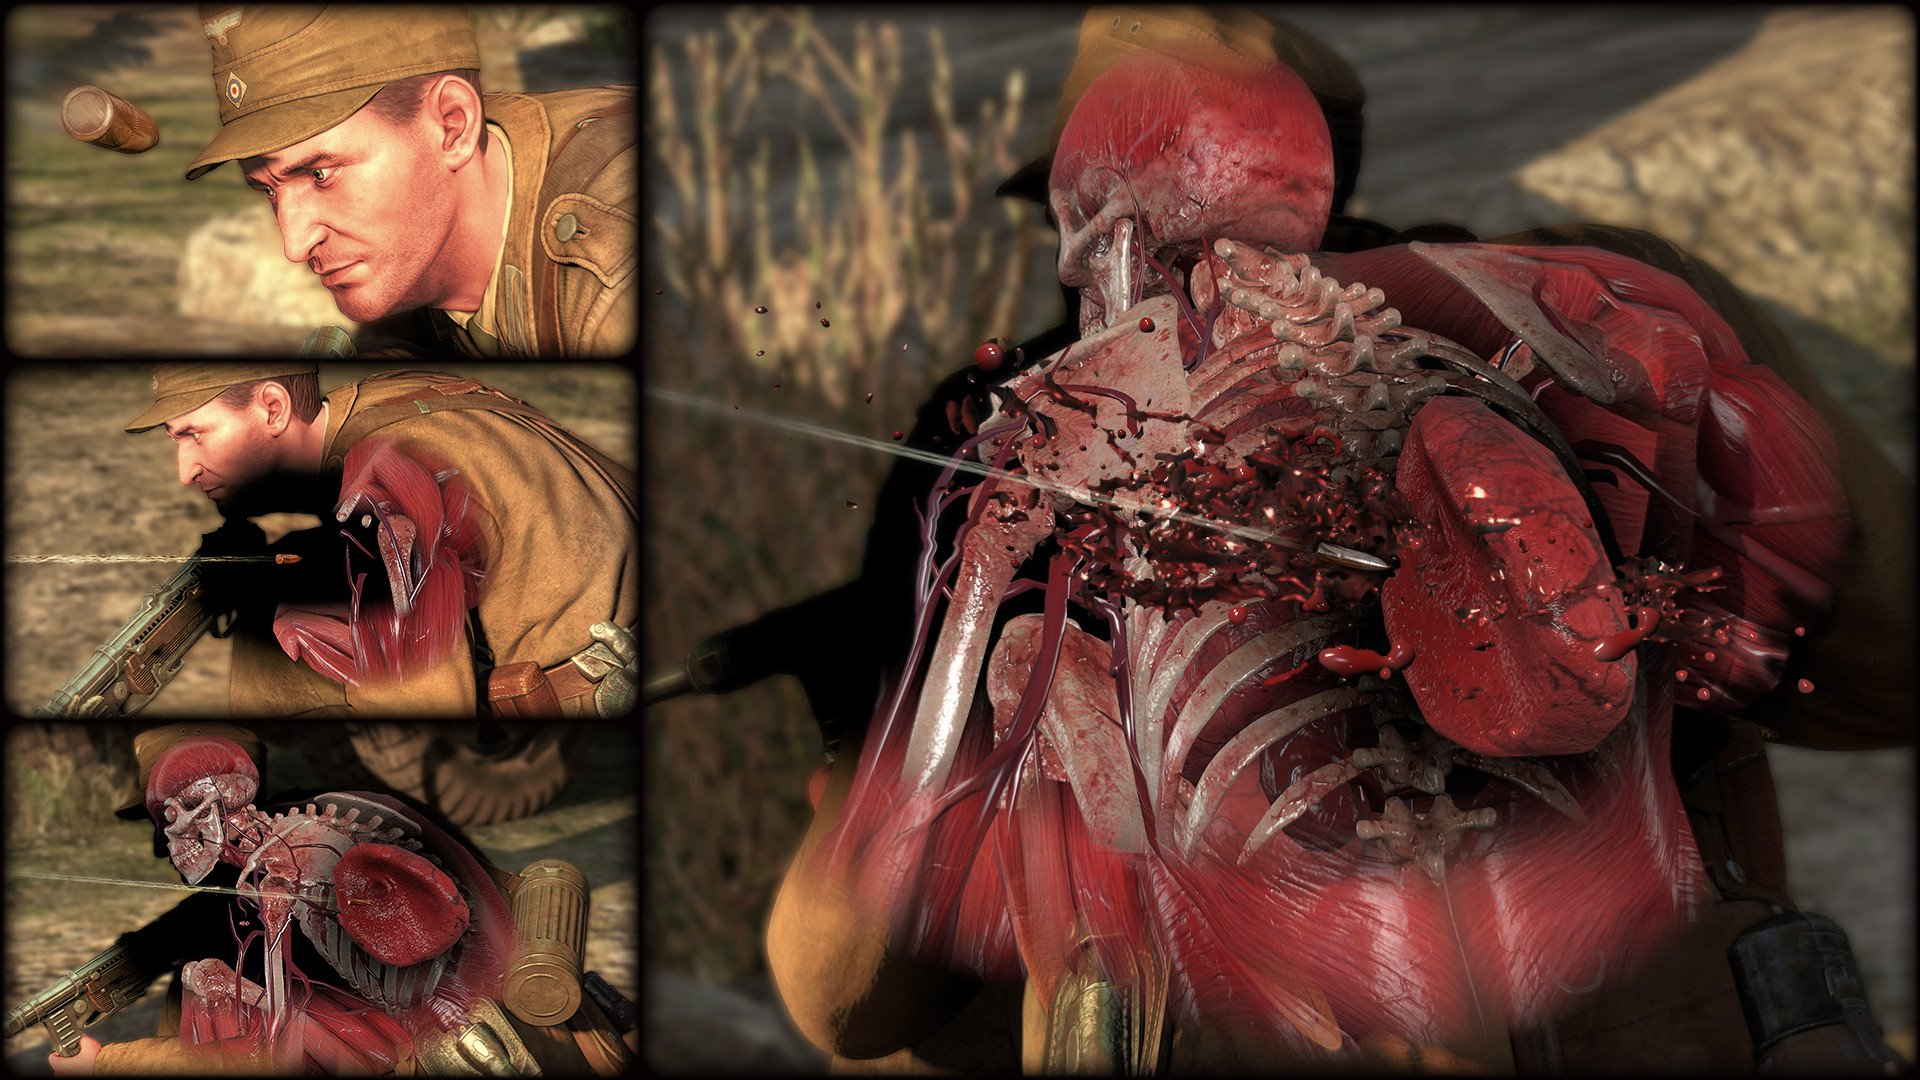 sniper elite 3 2537589 تصاویر جدیدی از Sniper Elite 3 منتشر شد : بیابان گردی در آفریقا